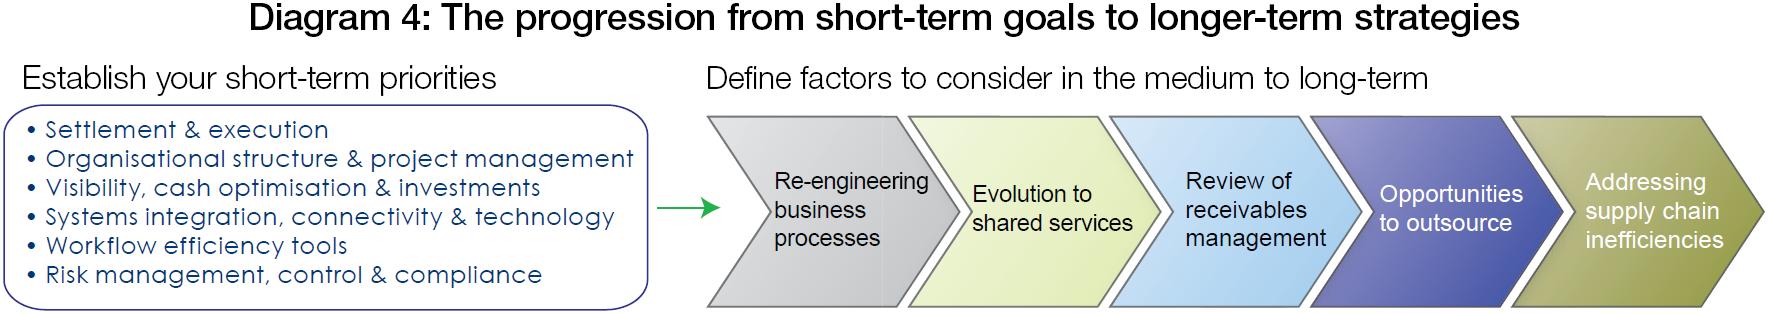 Driving efficiencies for post-merger treasury integration | Treasury